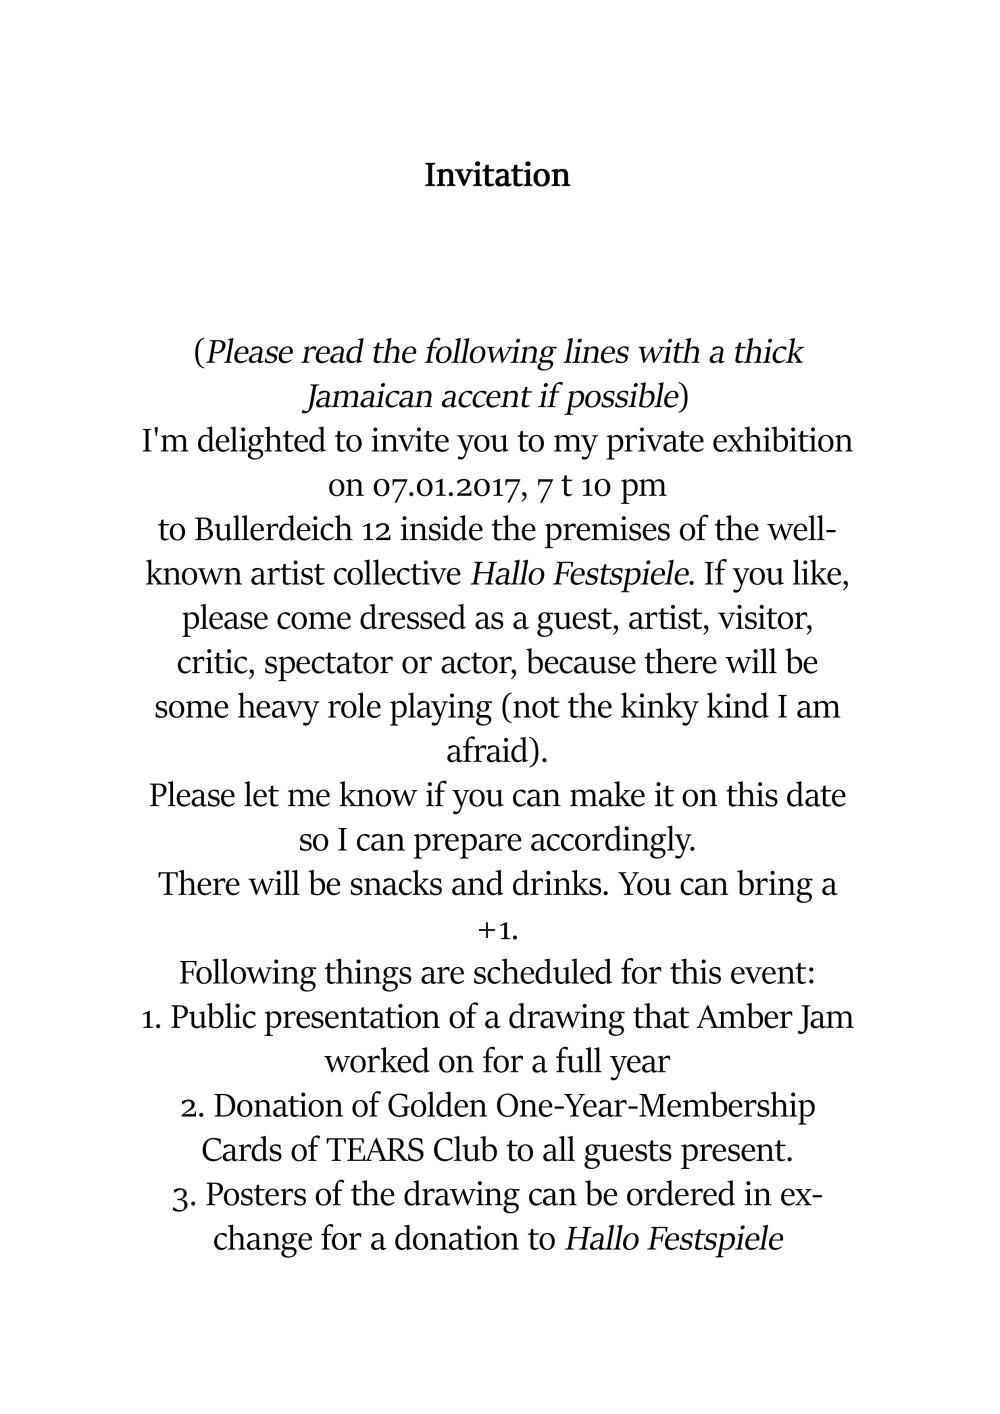 Amber Jam Invitation